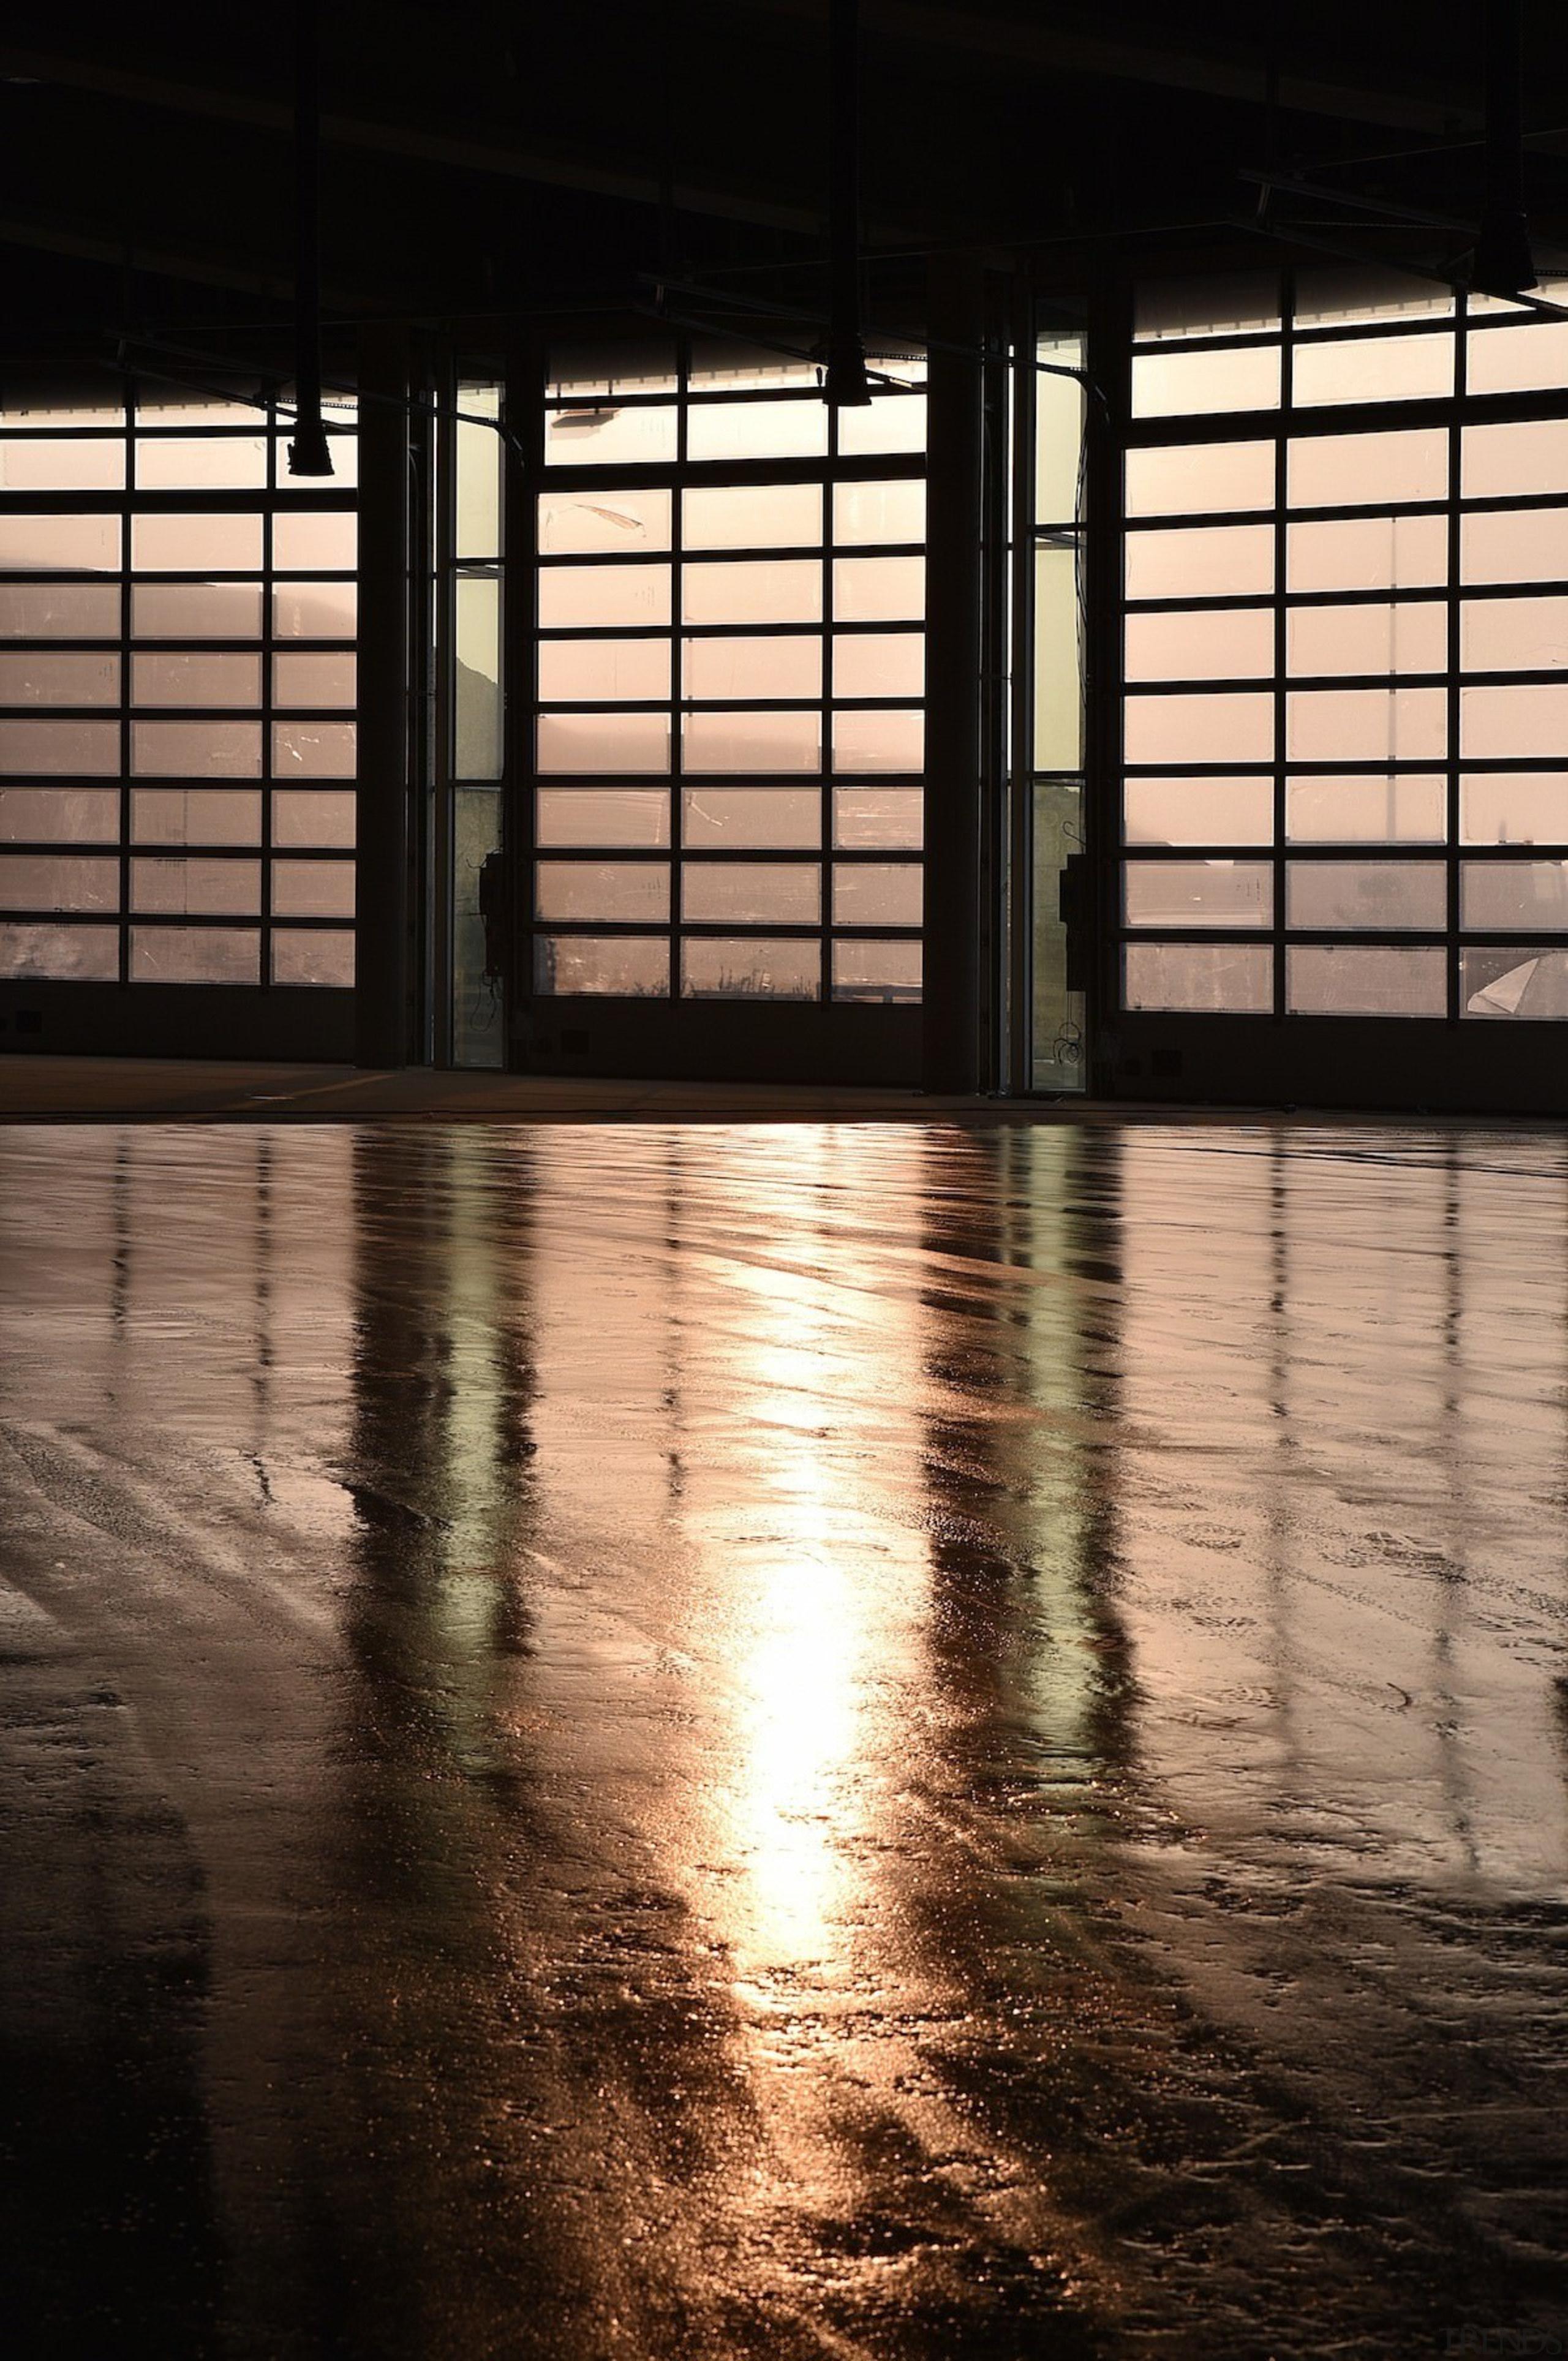 569 firestation - 569 firestation - architecture | architecture, evening, floor, flooring, light, lighting, line, reflection, shadow, structure, sunlight, water, window, wood, black